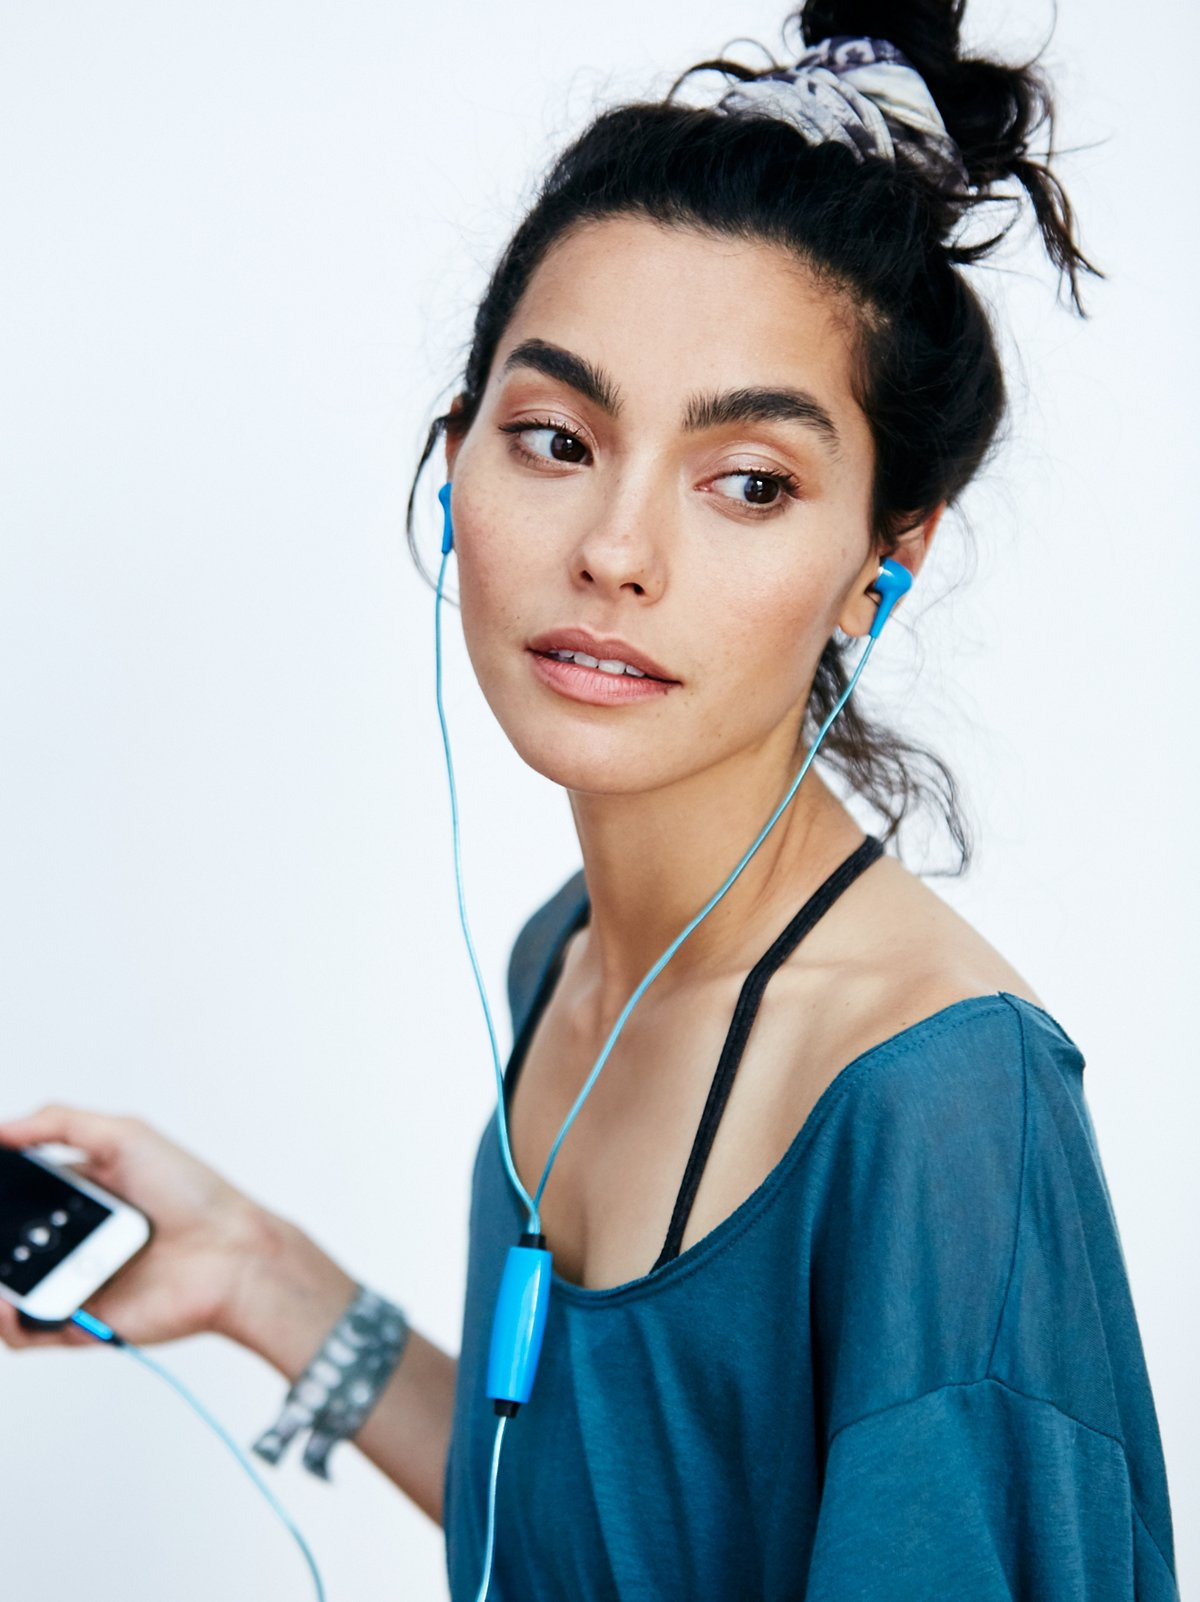 LED Light-Up Headphones